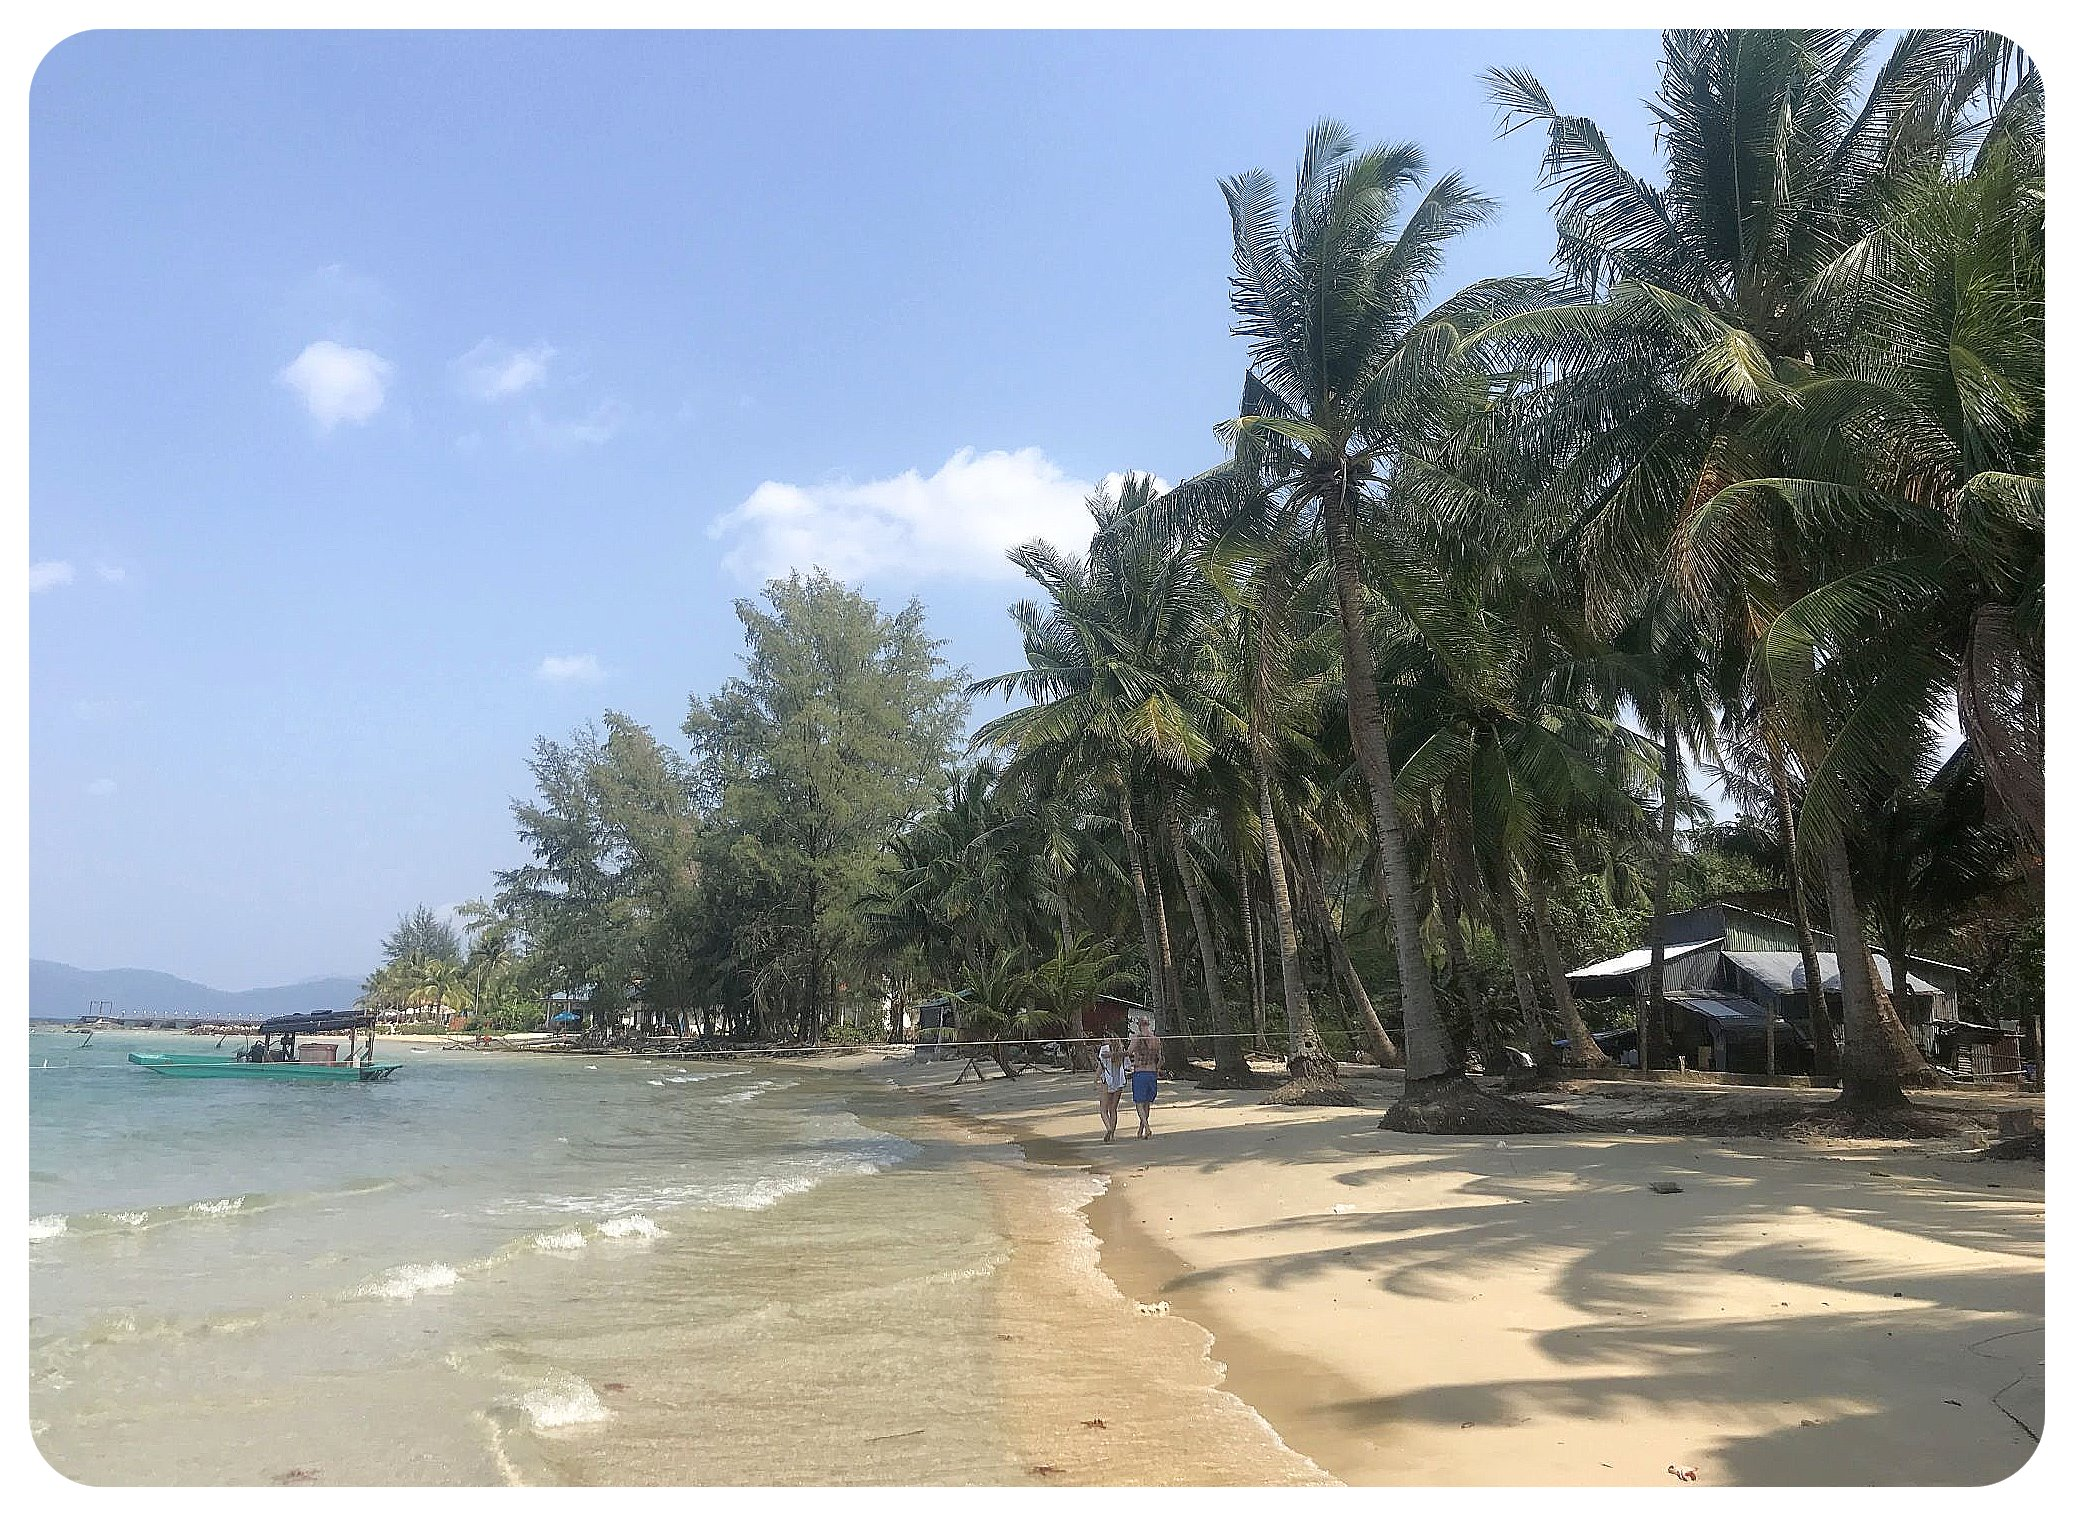 phu quoc deserted beach